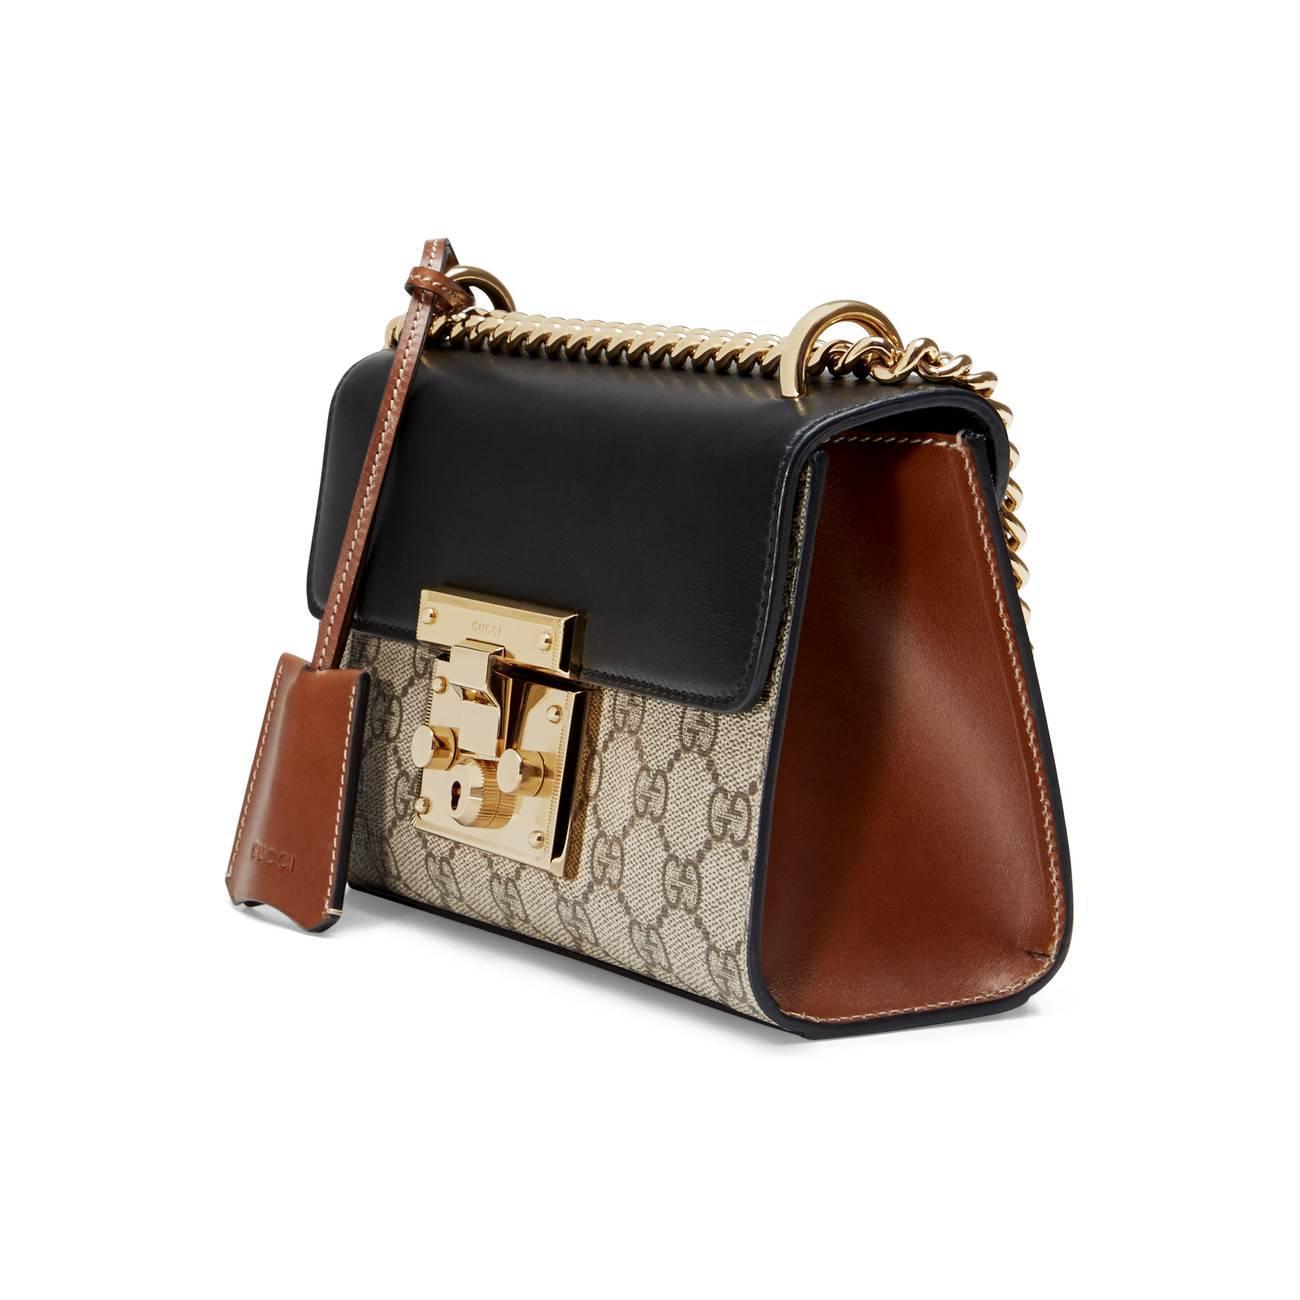 252b1f1631c Gucci - Multicolor Padlock Small GG Shoulder Bag - Lyst. View fullscreen